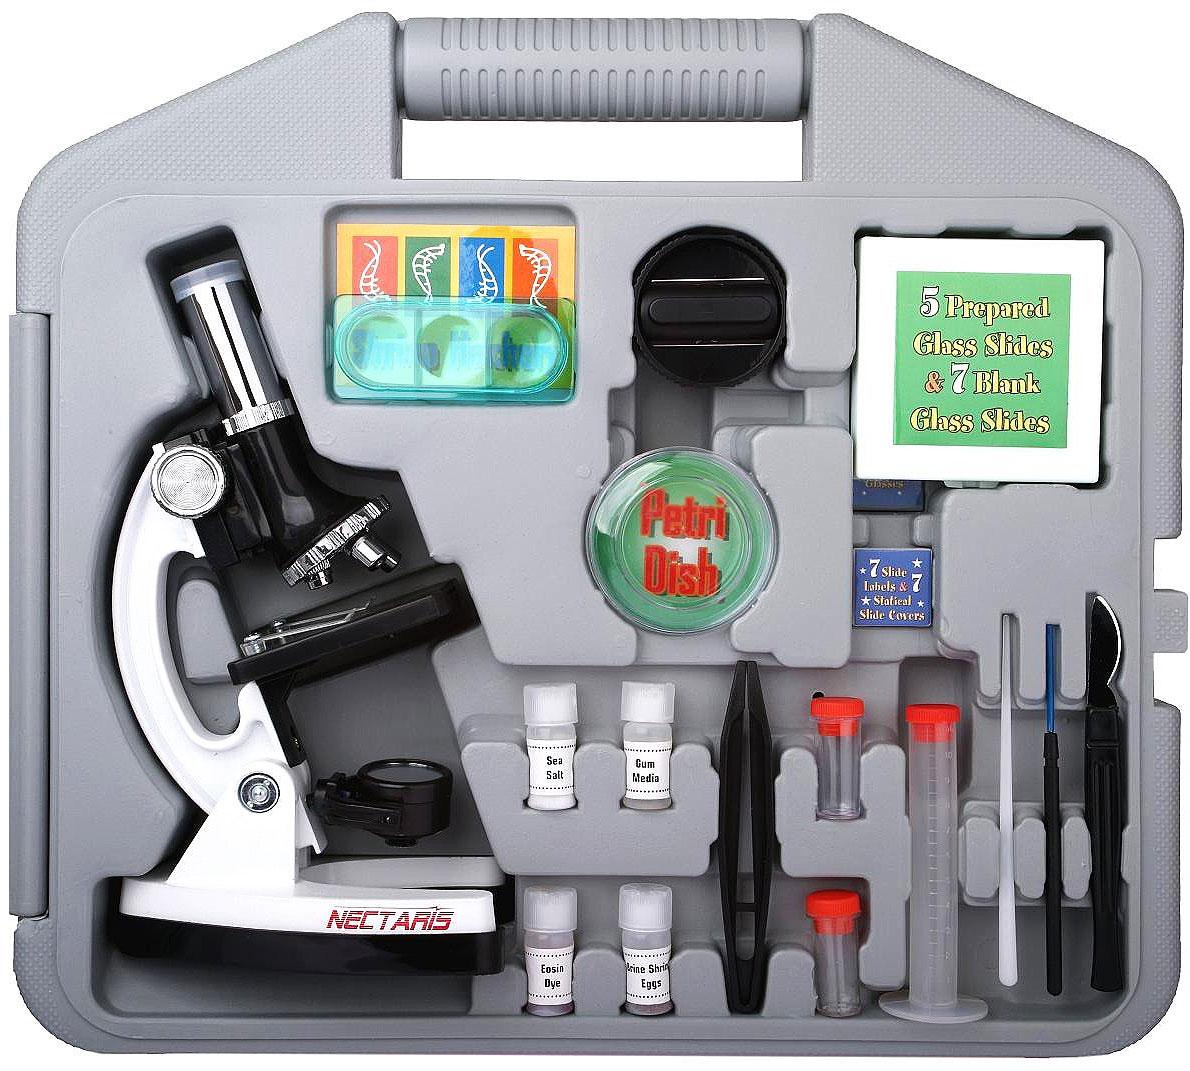 Kinder-Mikroskop NECTARIS 900x (Lern-Set)